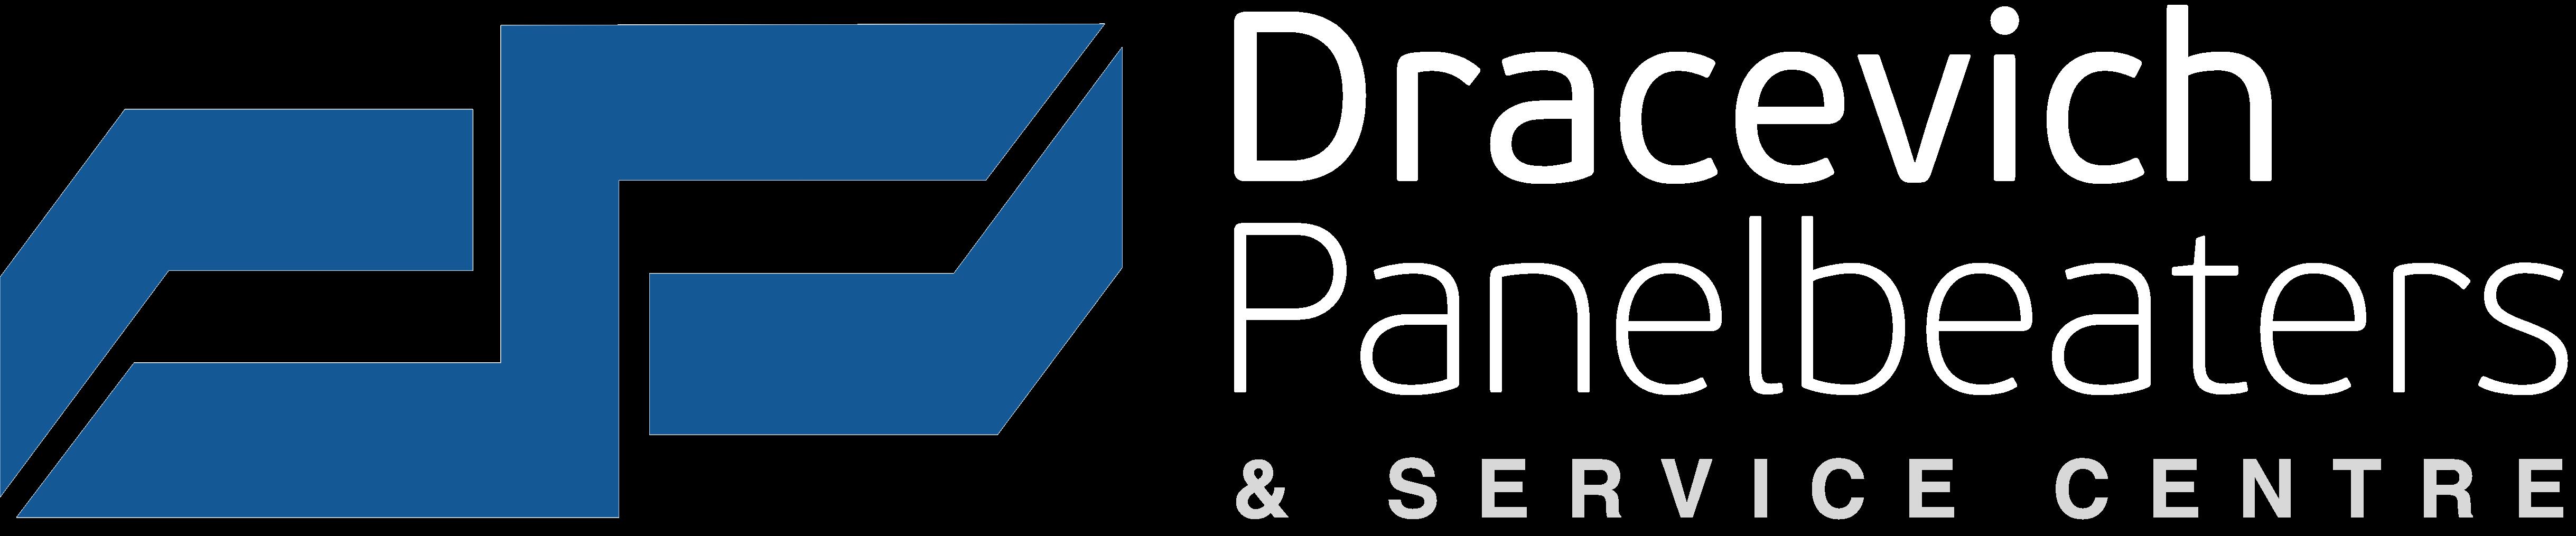 Dracevich Panelbeaters